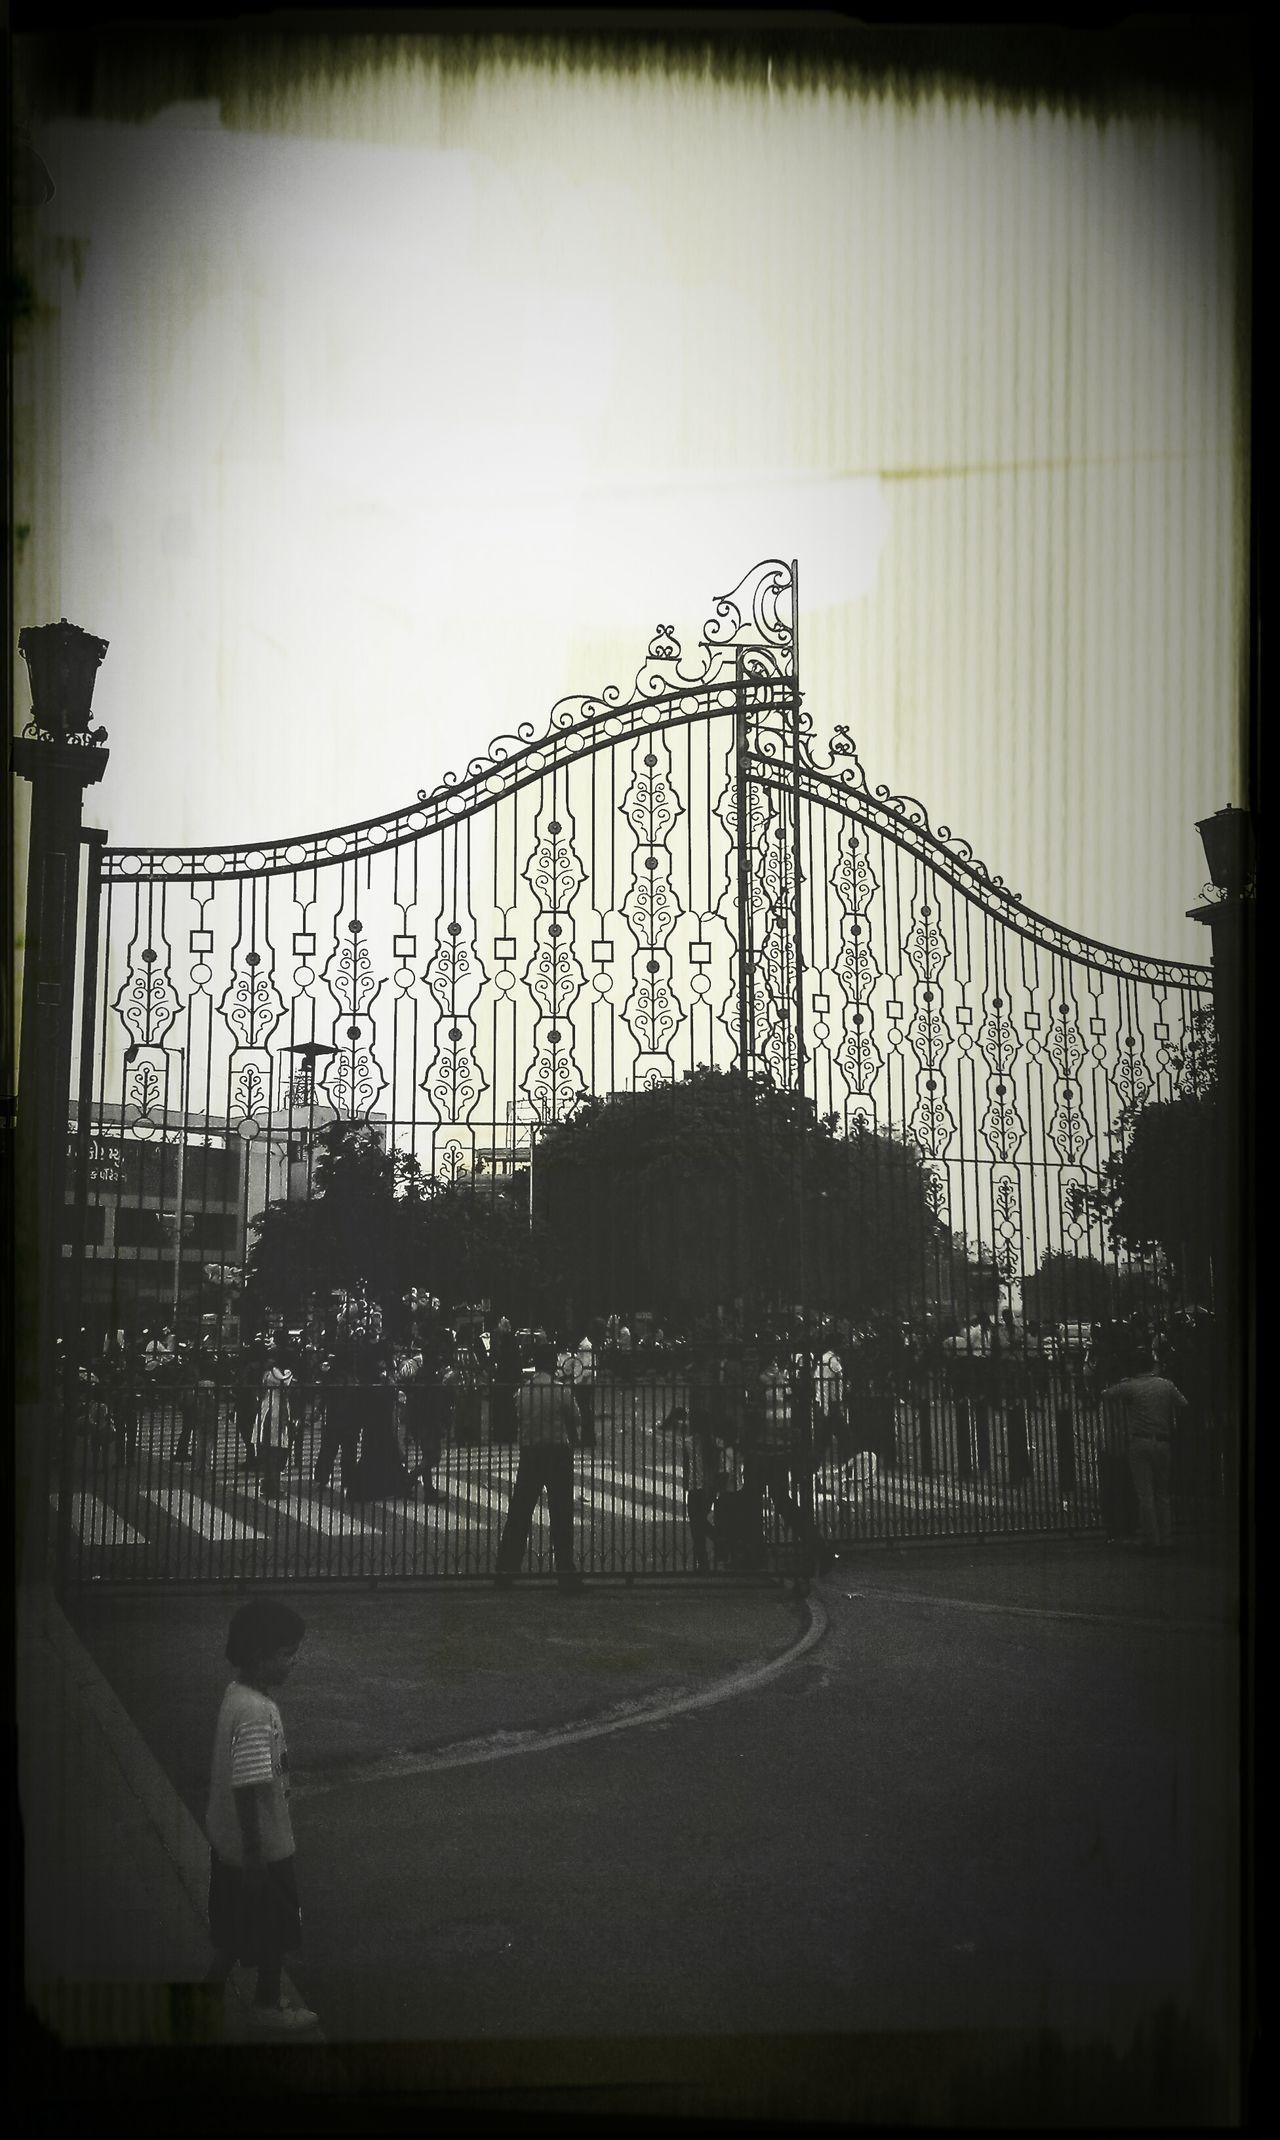 Gate Entrance Lakeshore Monochrome Photography